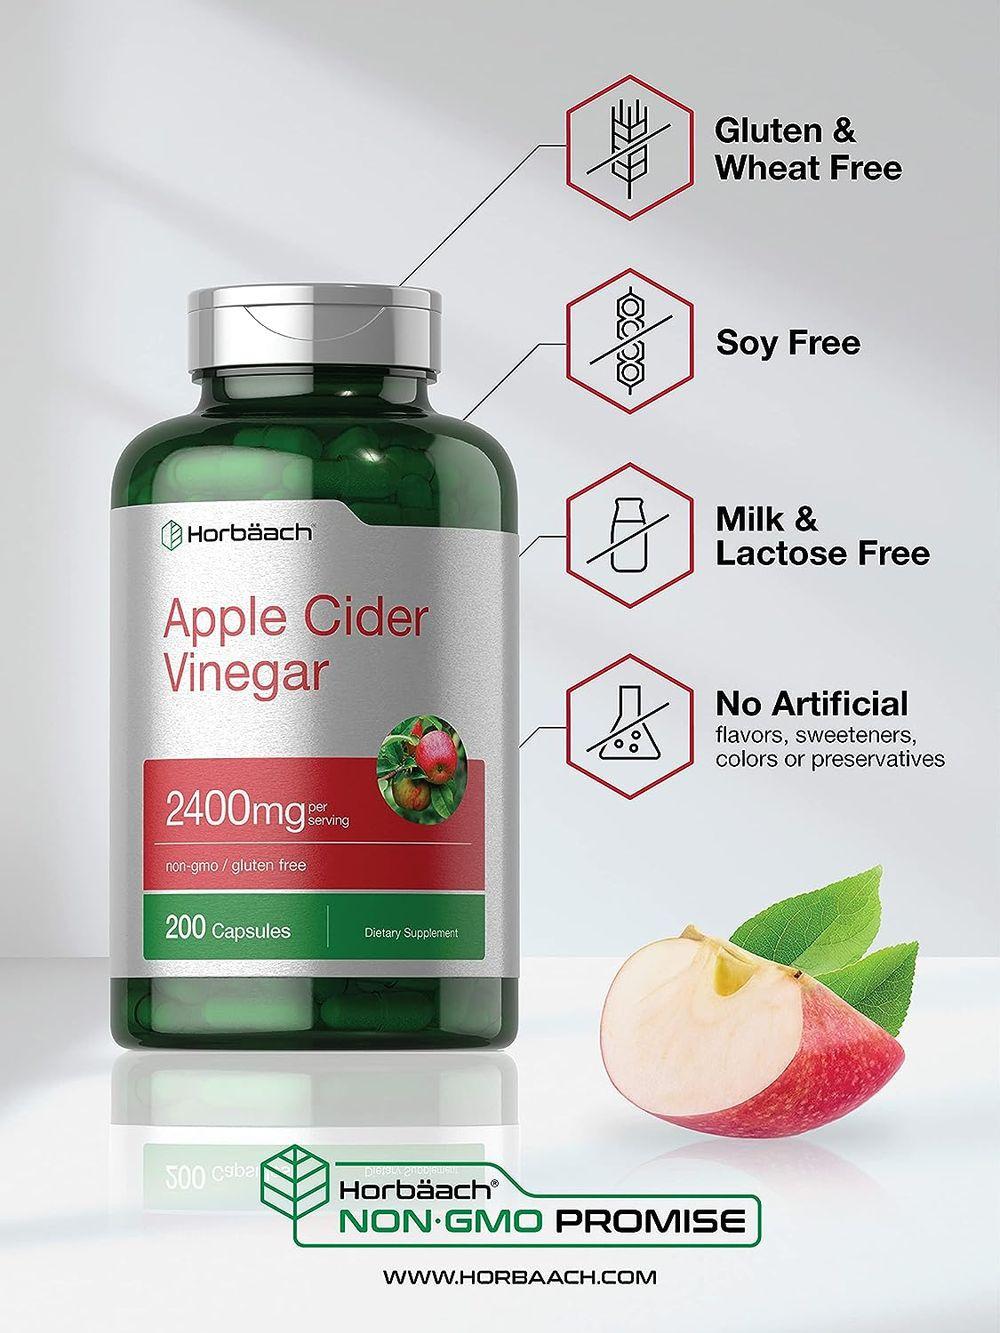 Apple Cider Vinegar Capsules | 2400mg | 200 Pills | Non-GMO, Gluten Free | by Horbaach